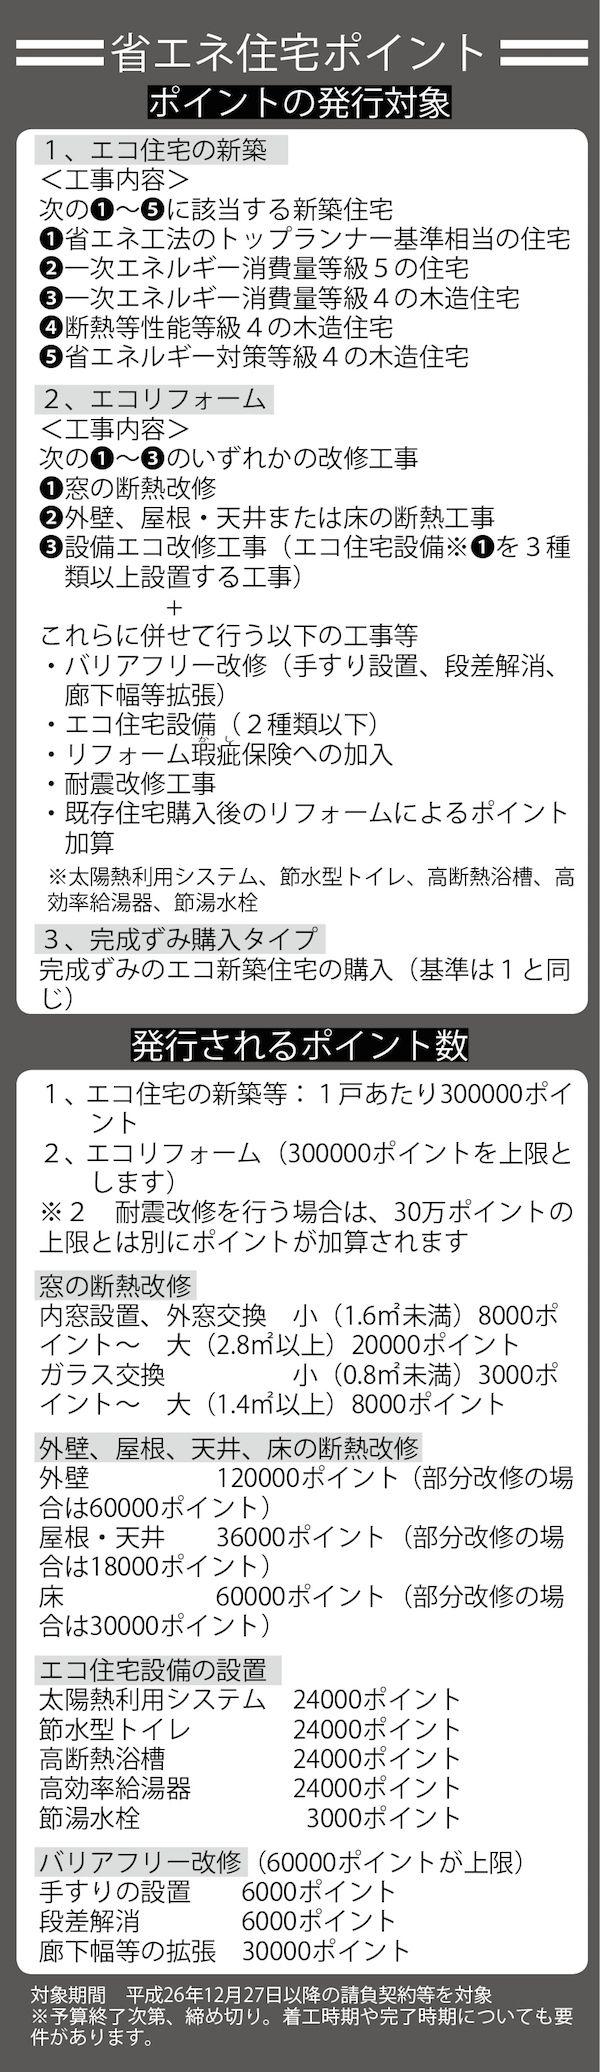 20150728_ecopoint_graphic